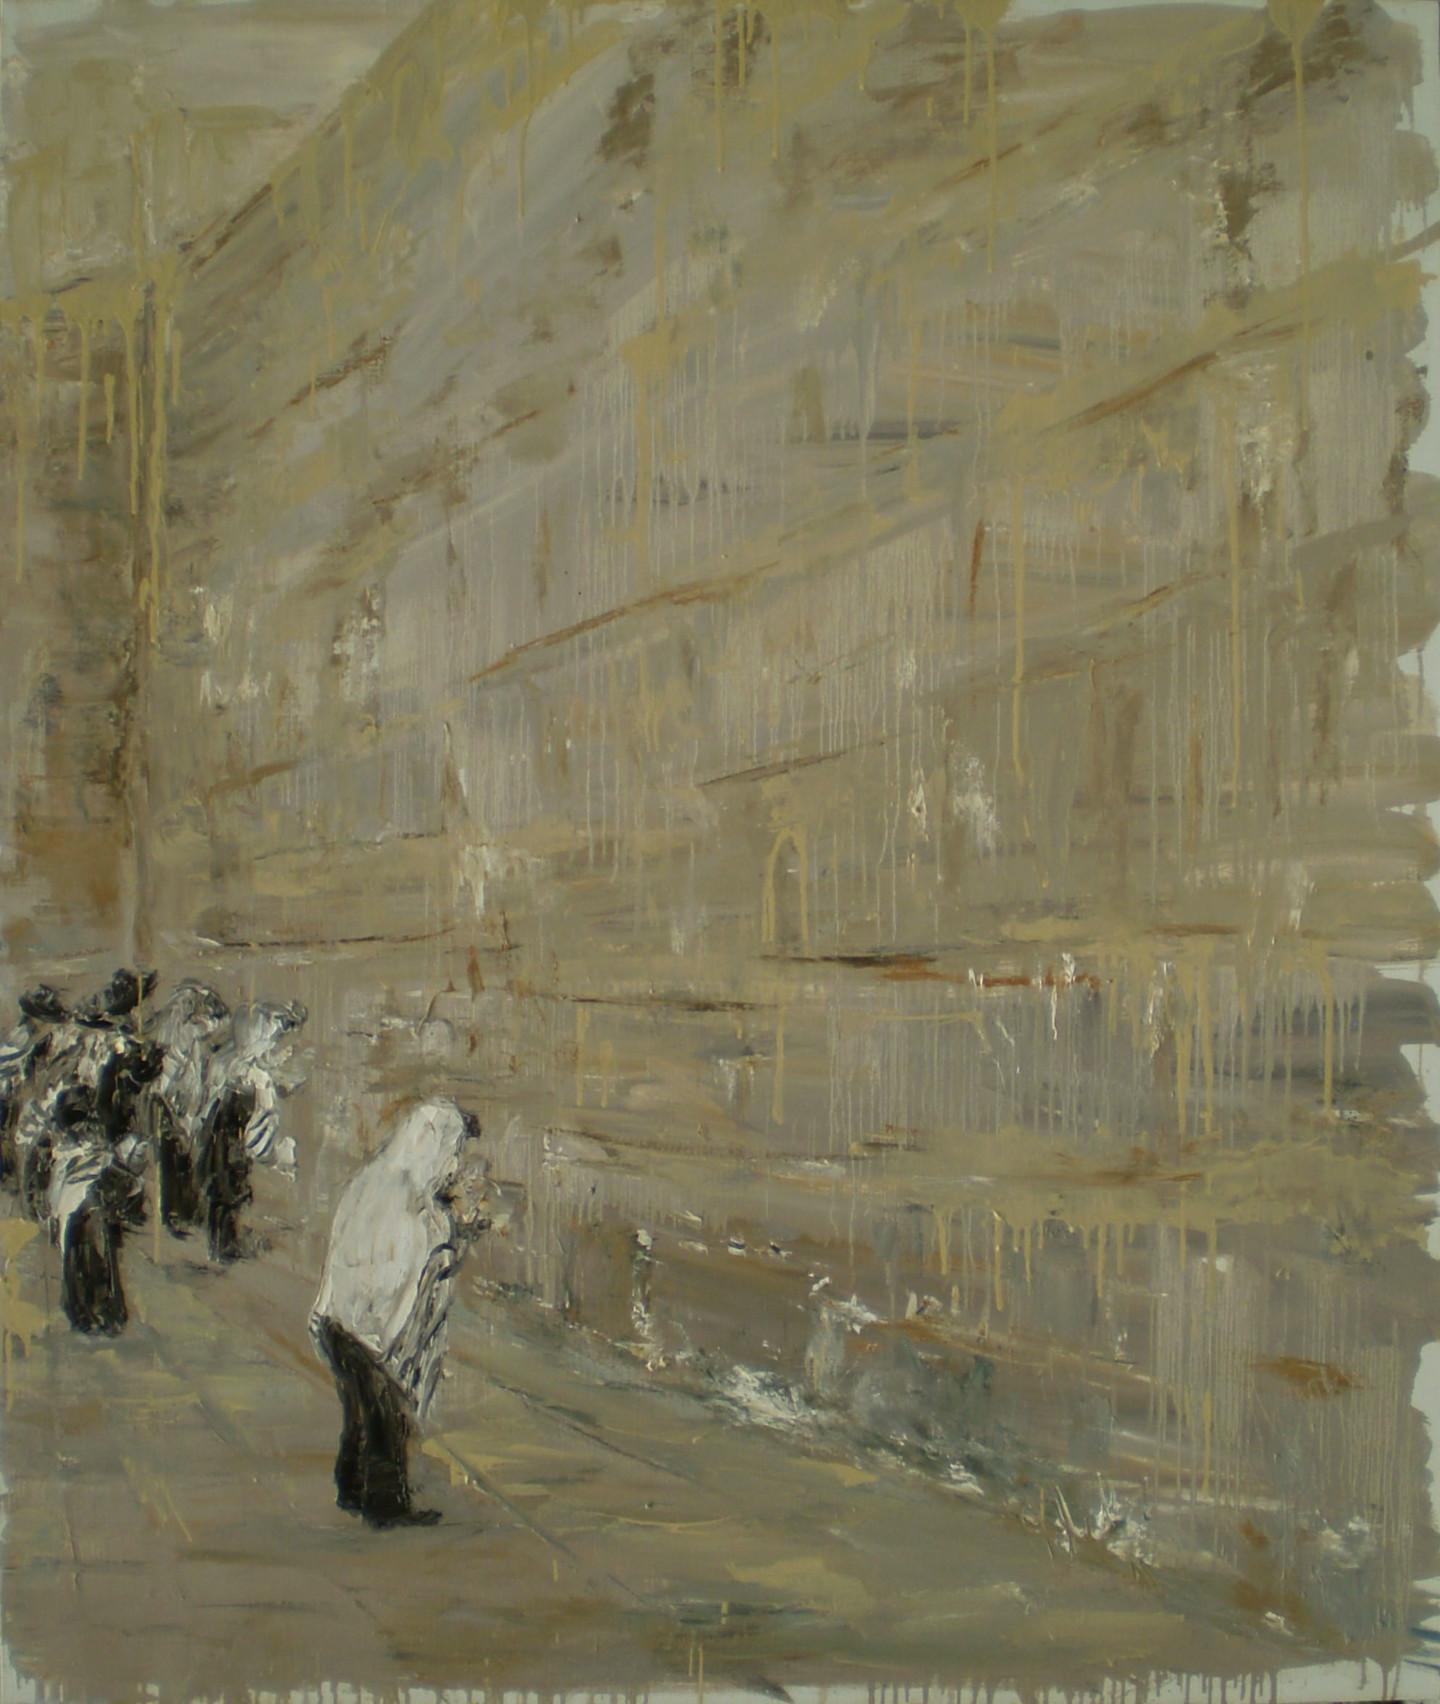 Alla Preobrazhenska-Ronikier - Wall of Tears.Prayer